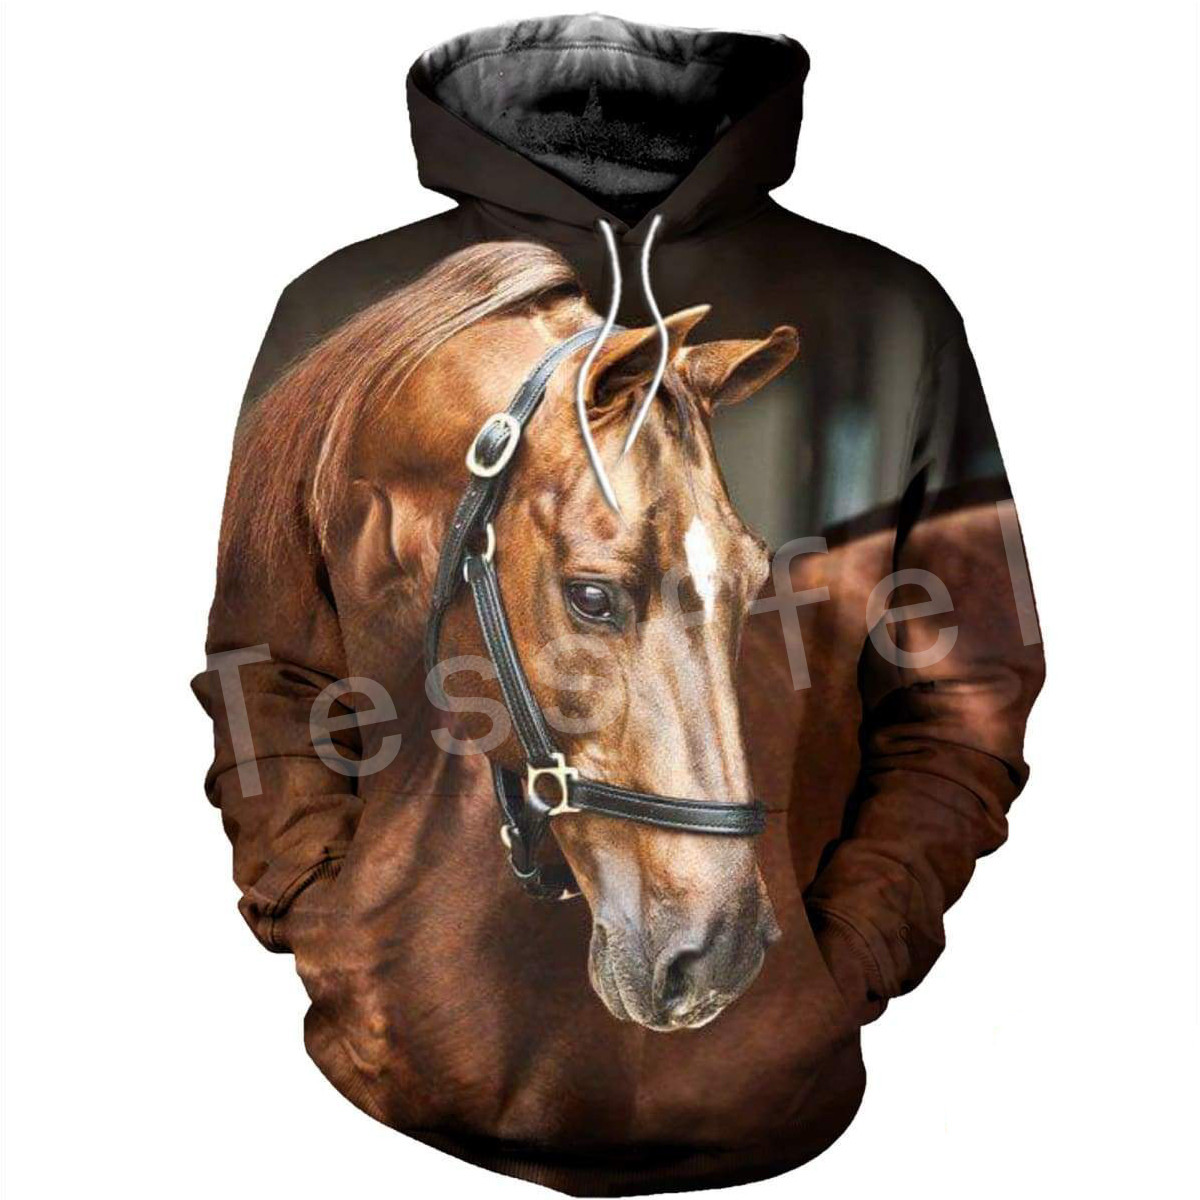 Tessffel Animal Horse Art Unisex Colorful Casual Tracksuit Harajuku 3Dfull Print Hoodie/Sweatshirt/Jacket/Mens Womens S-9